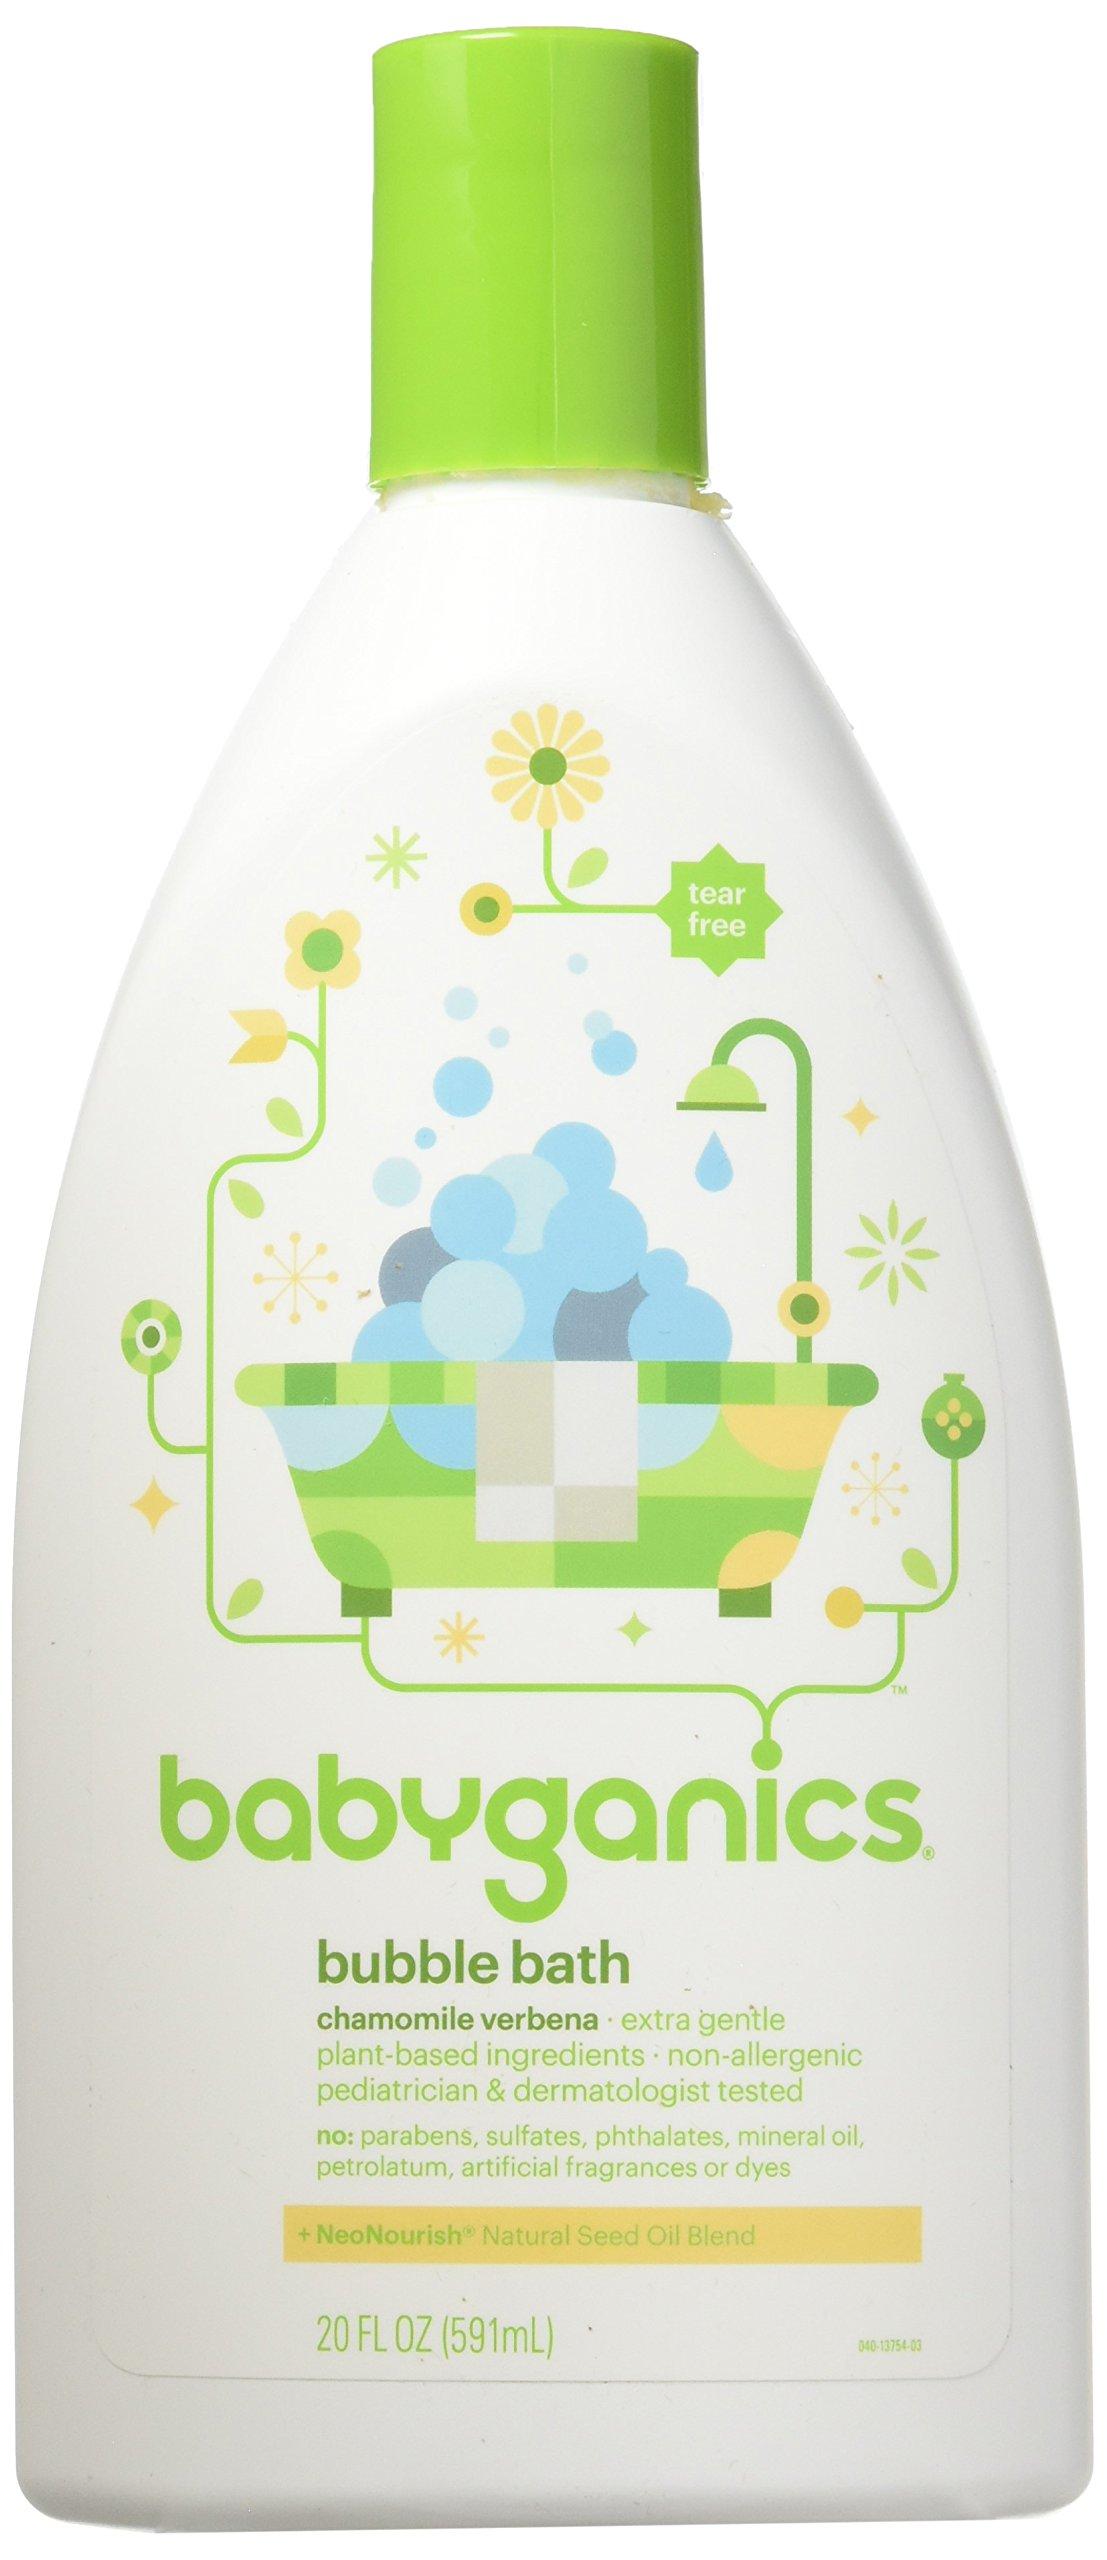 Babyganics Bubble Bath Chamomile Verbena 20 oz (Pack of 2) by Babyganics